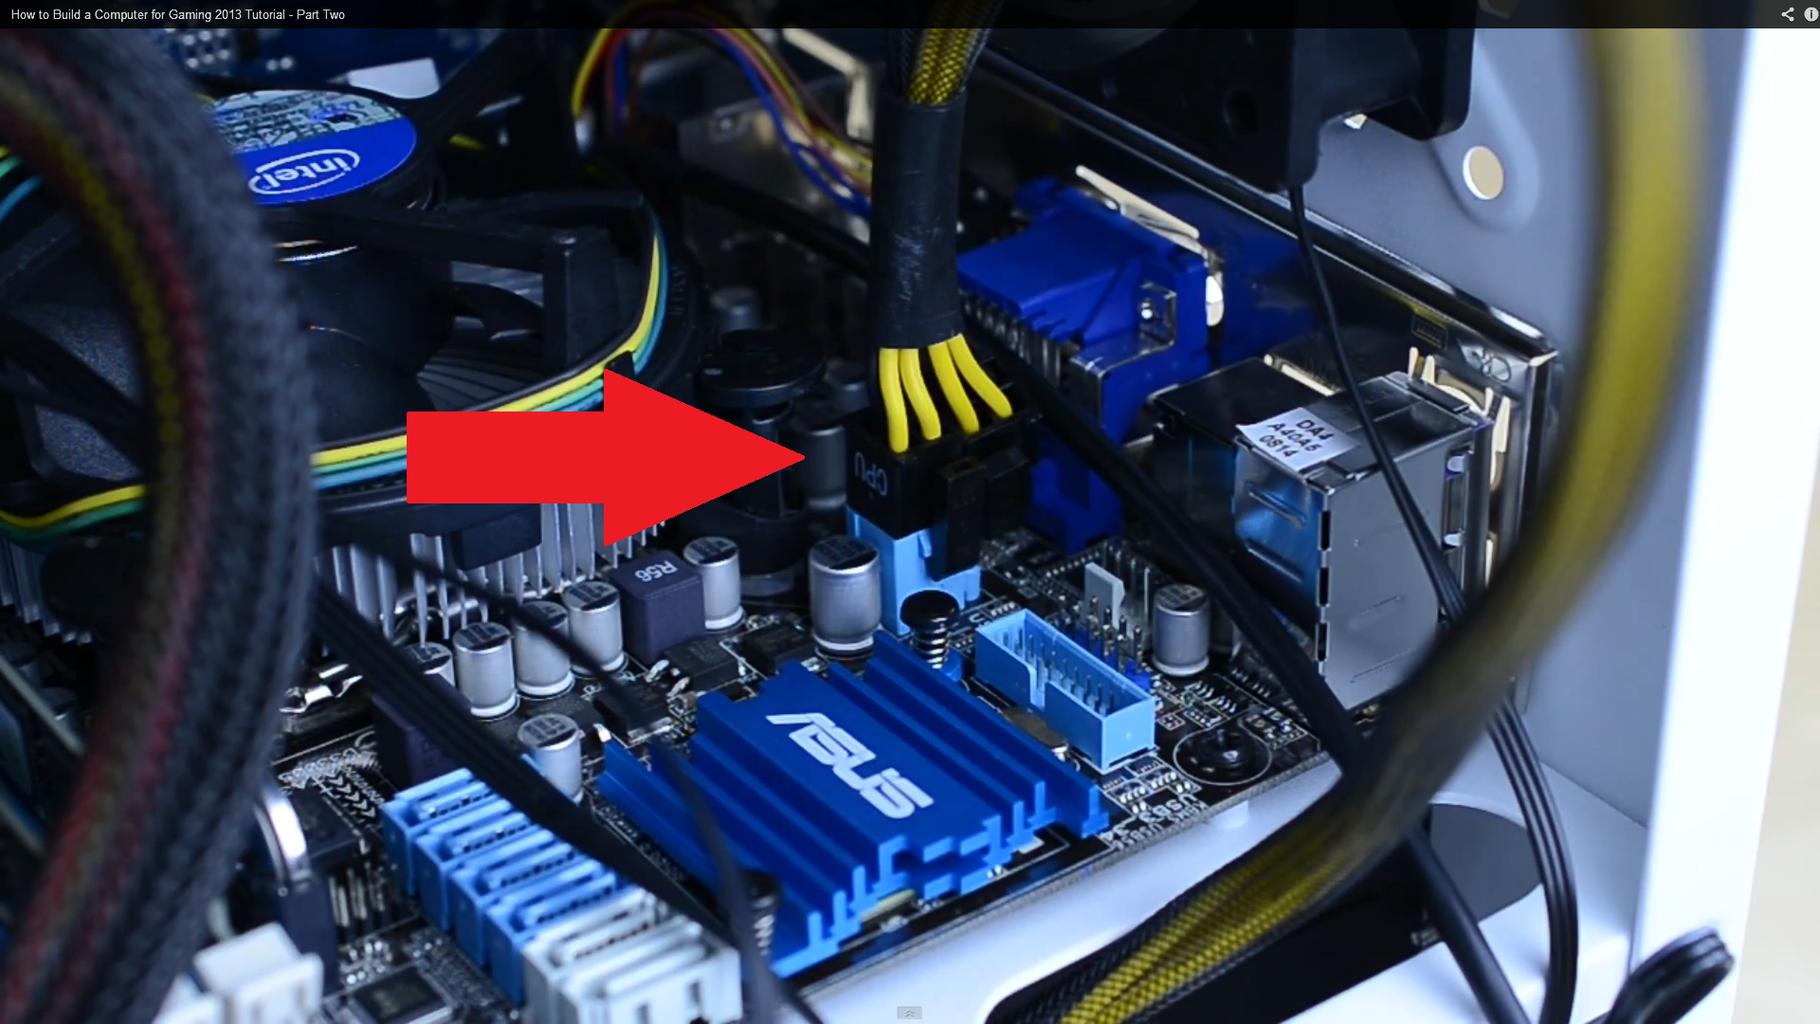 Plug CPU Power Pins In